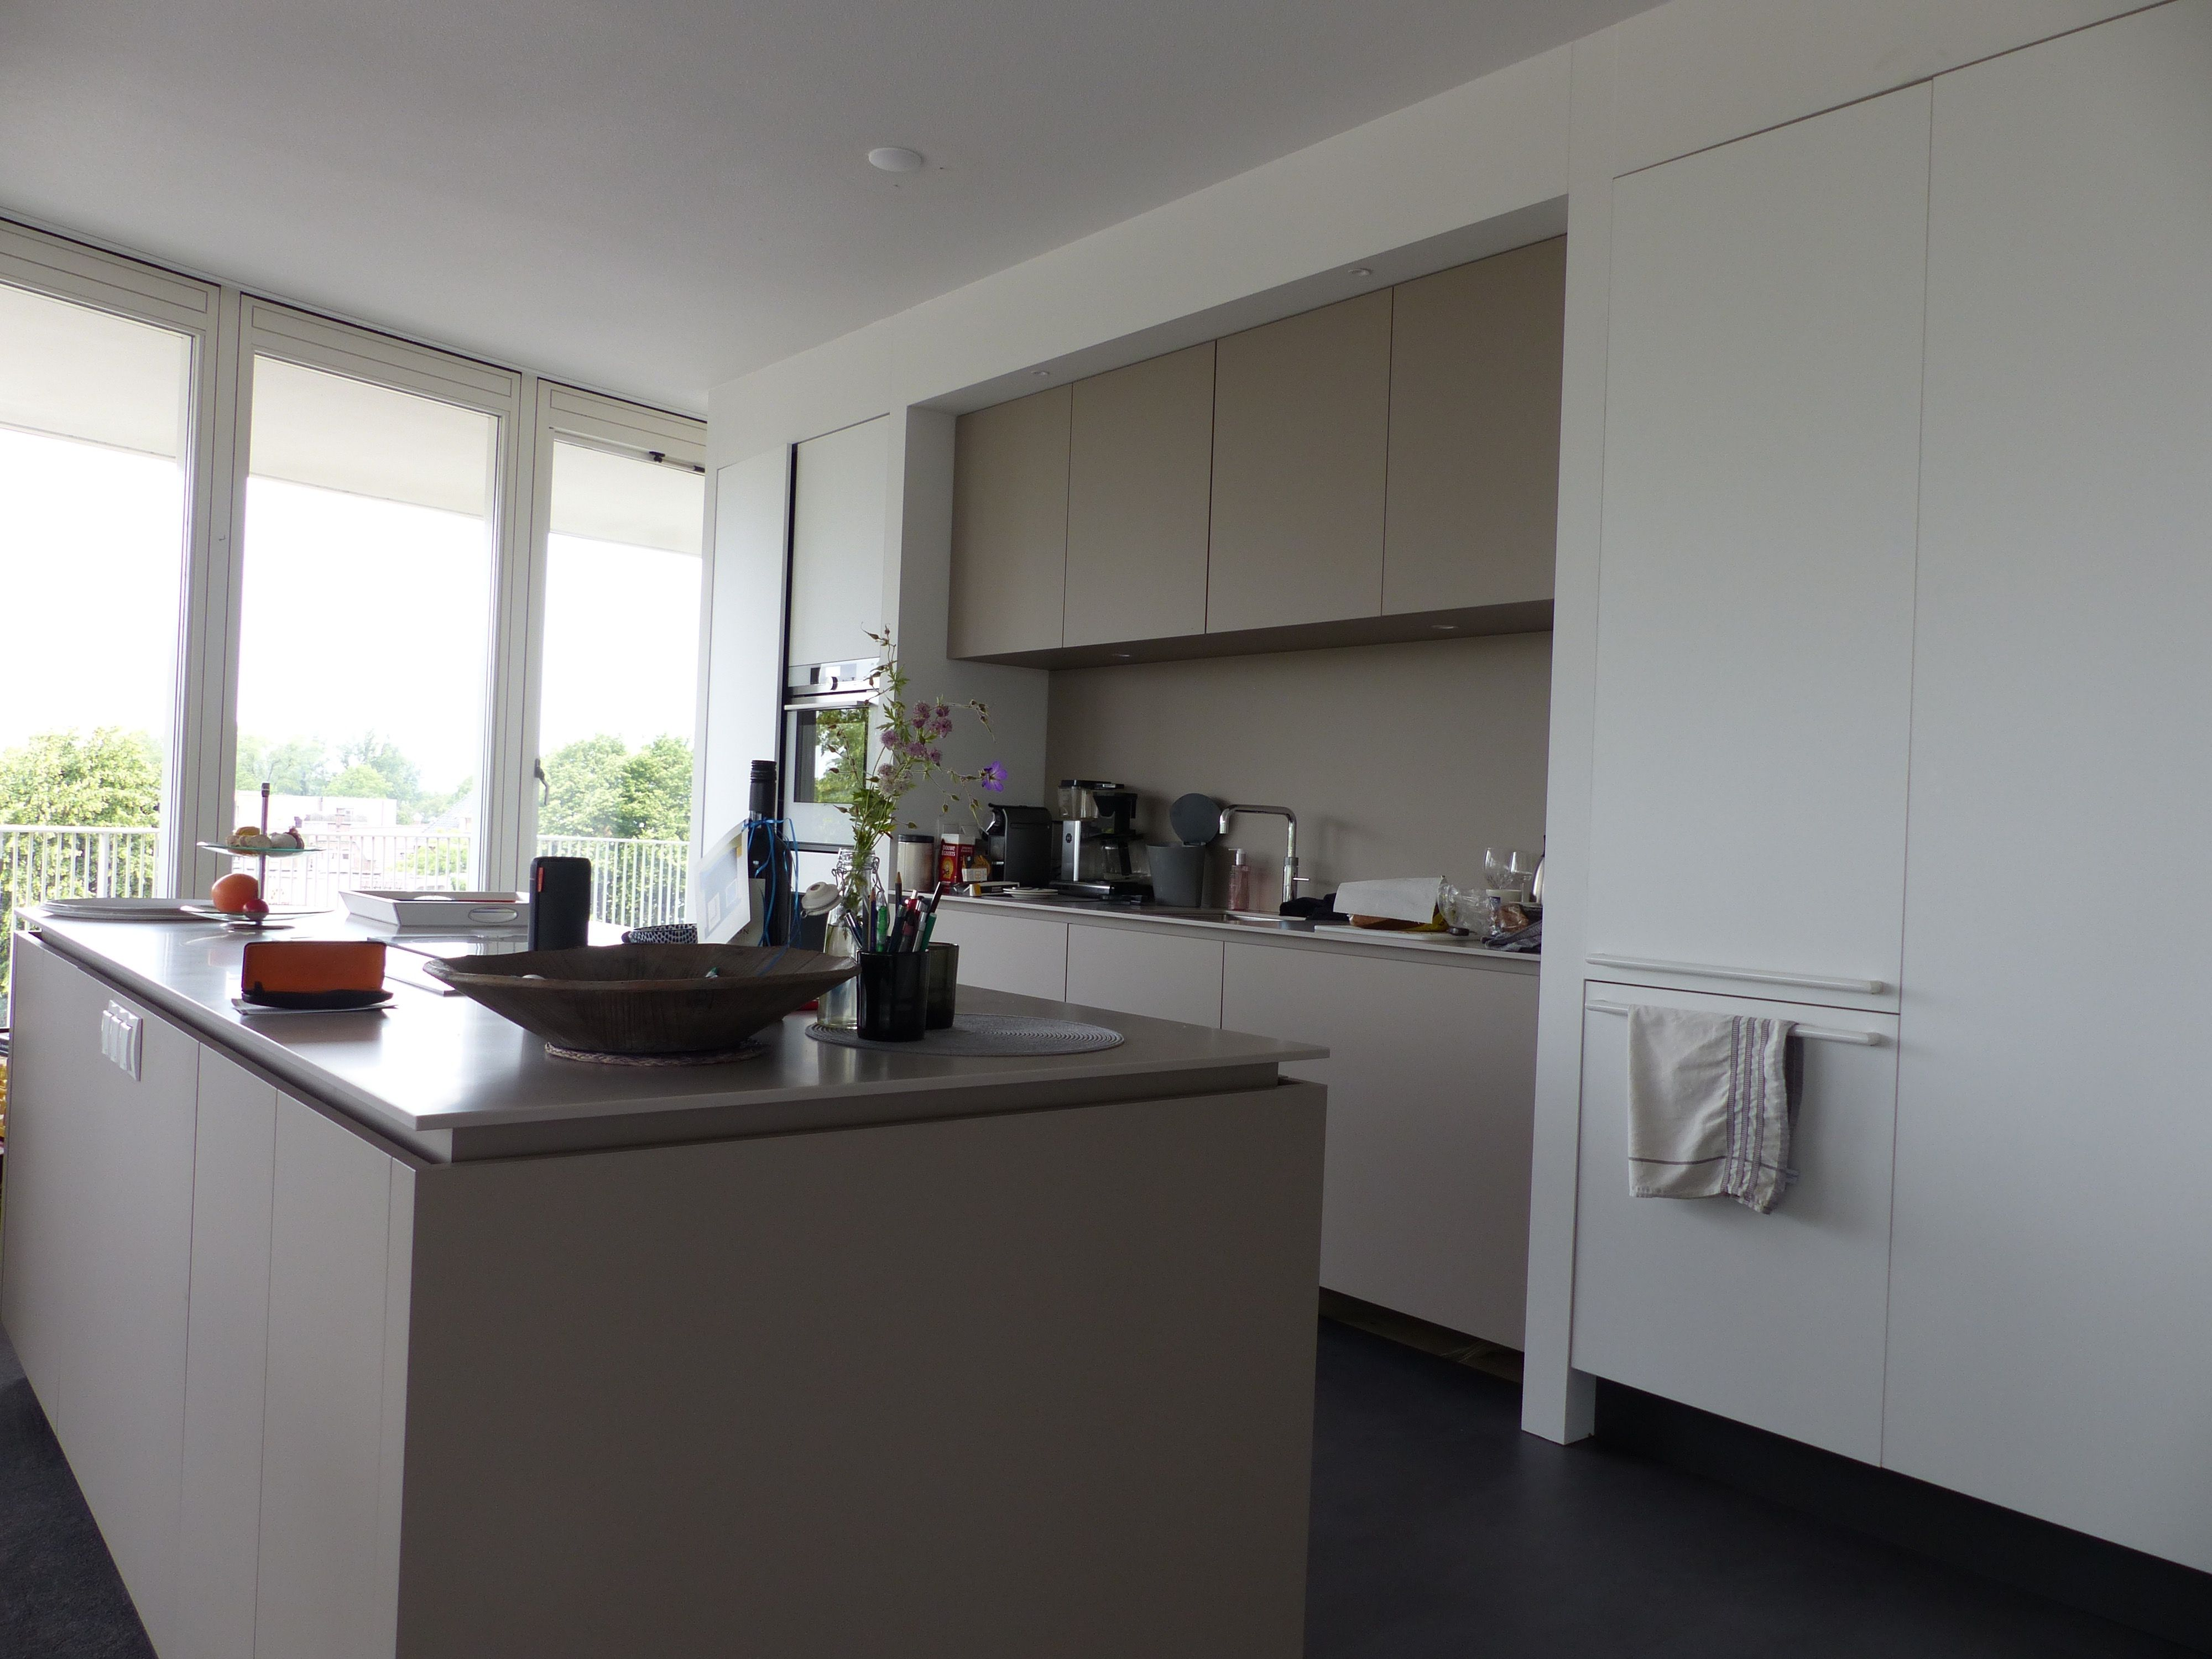 interieurdesign / keuken / maatwerk keuken / Interieur